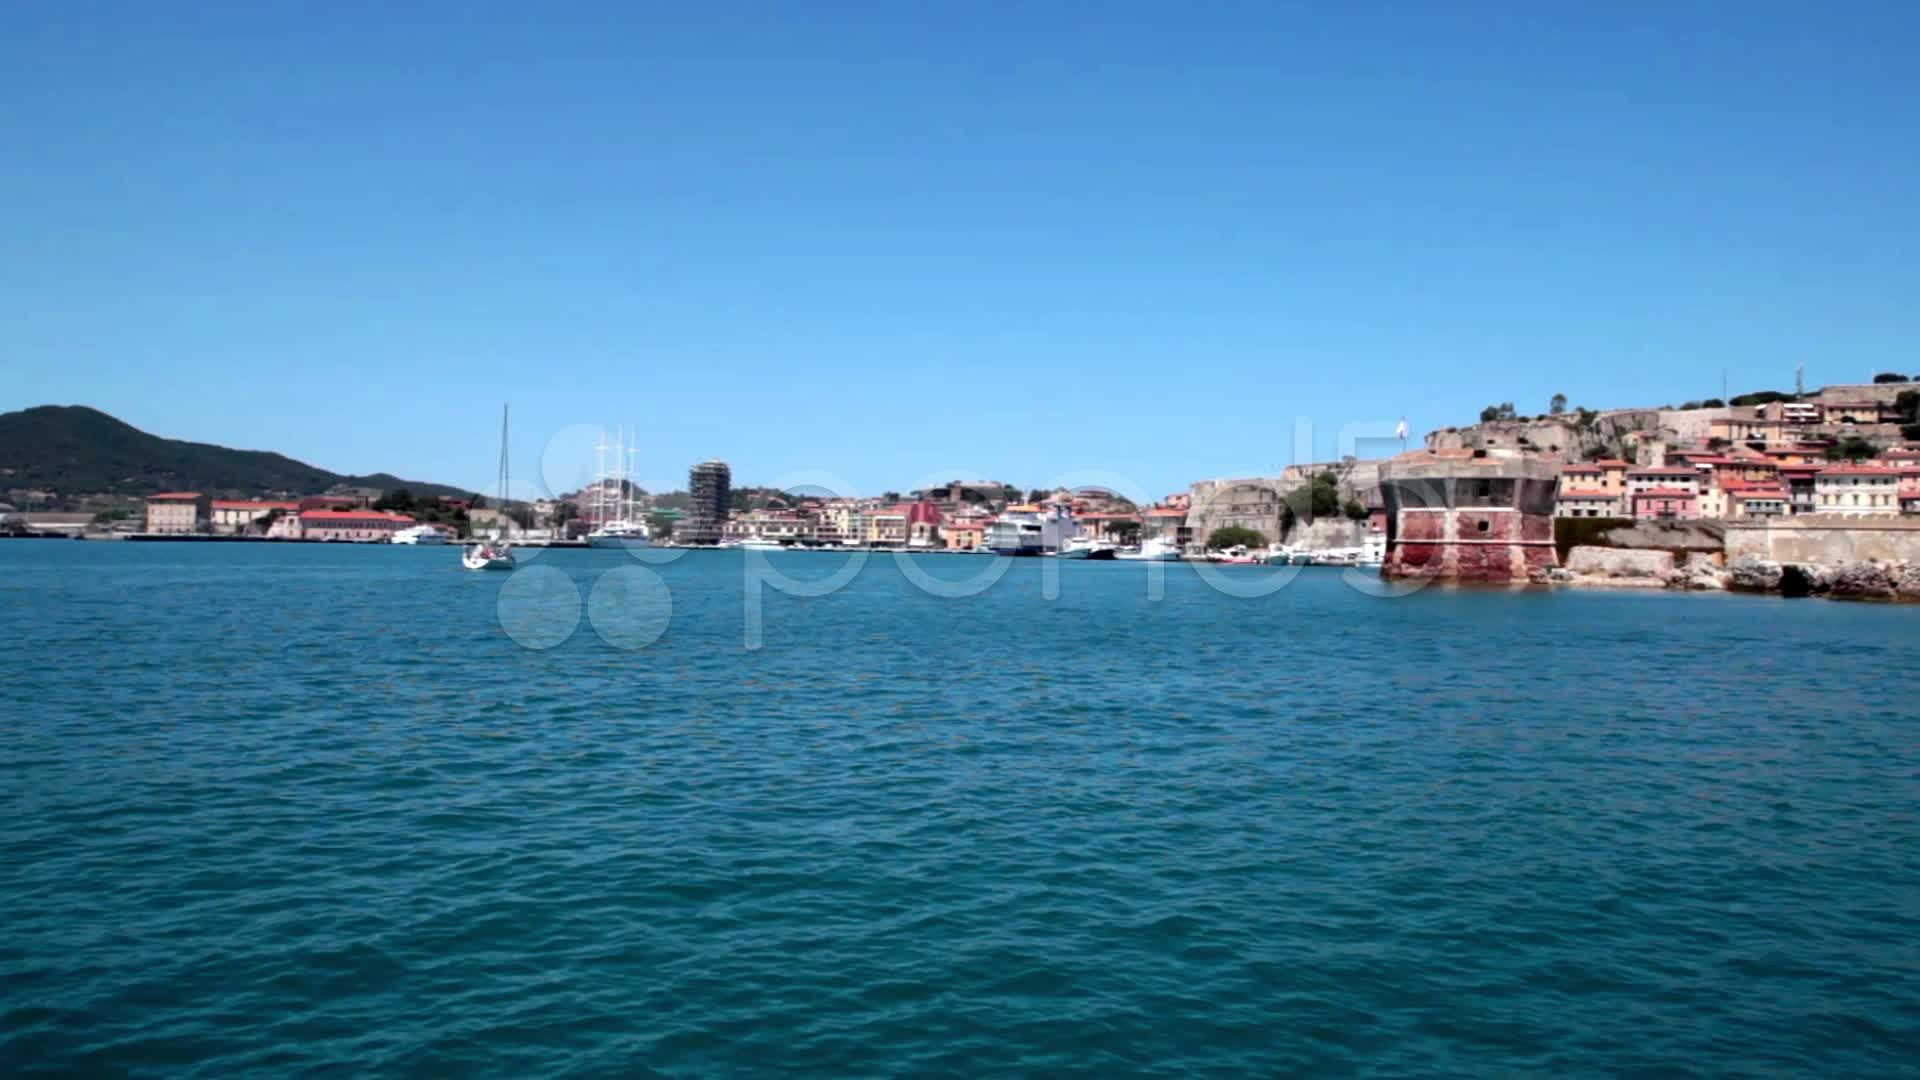 Sailing To Portoferraio, Elba Island - Stock Footage | by eZeePicsStudio